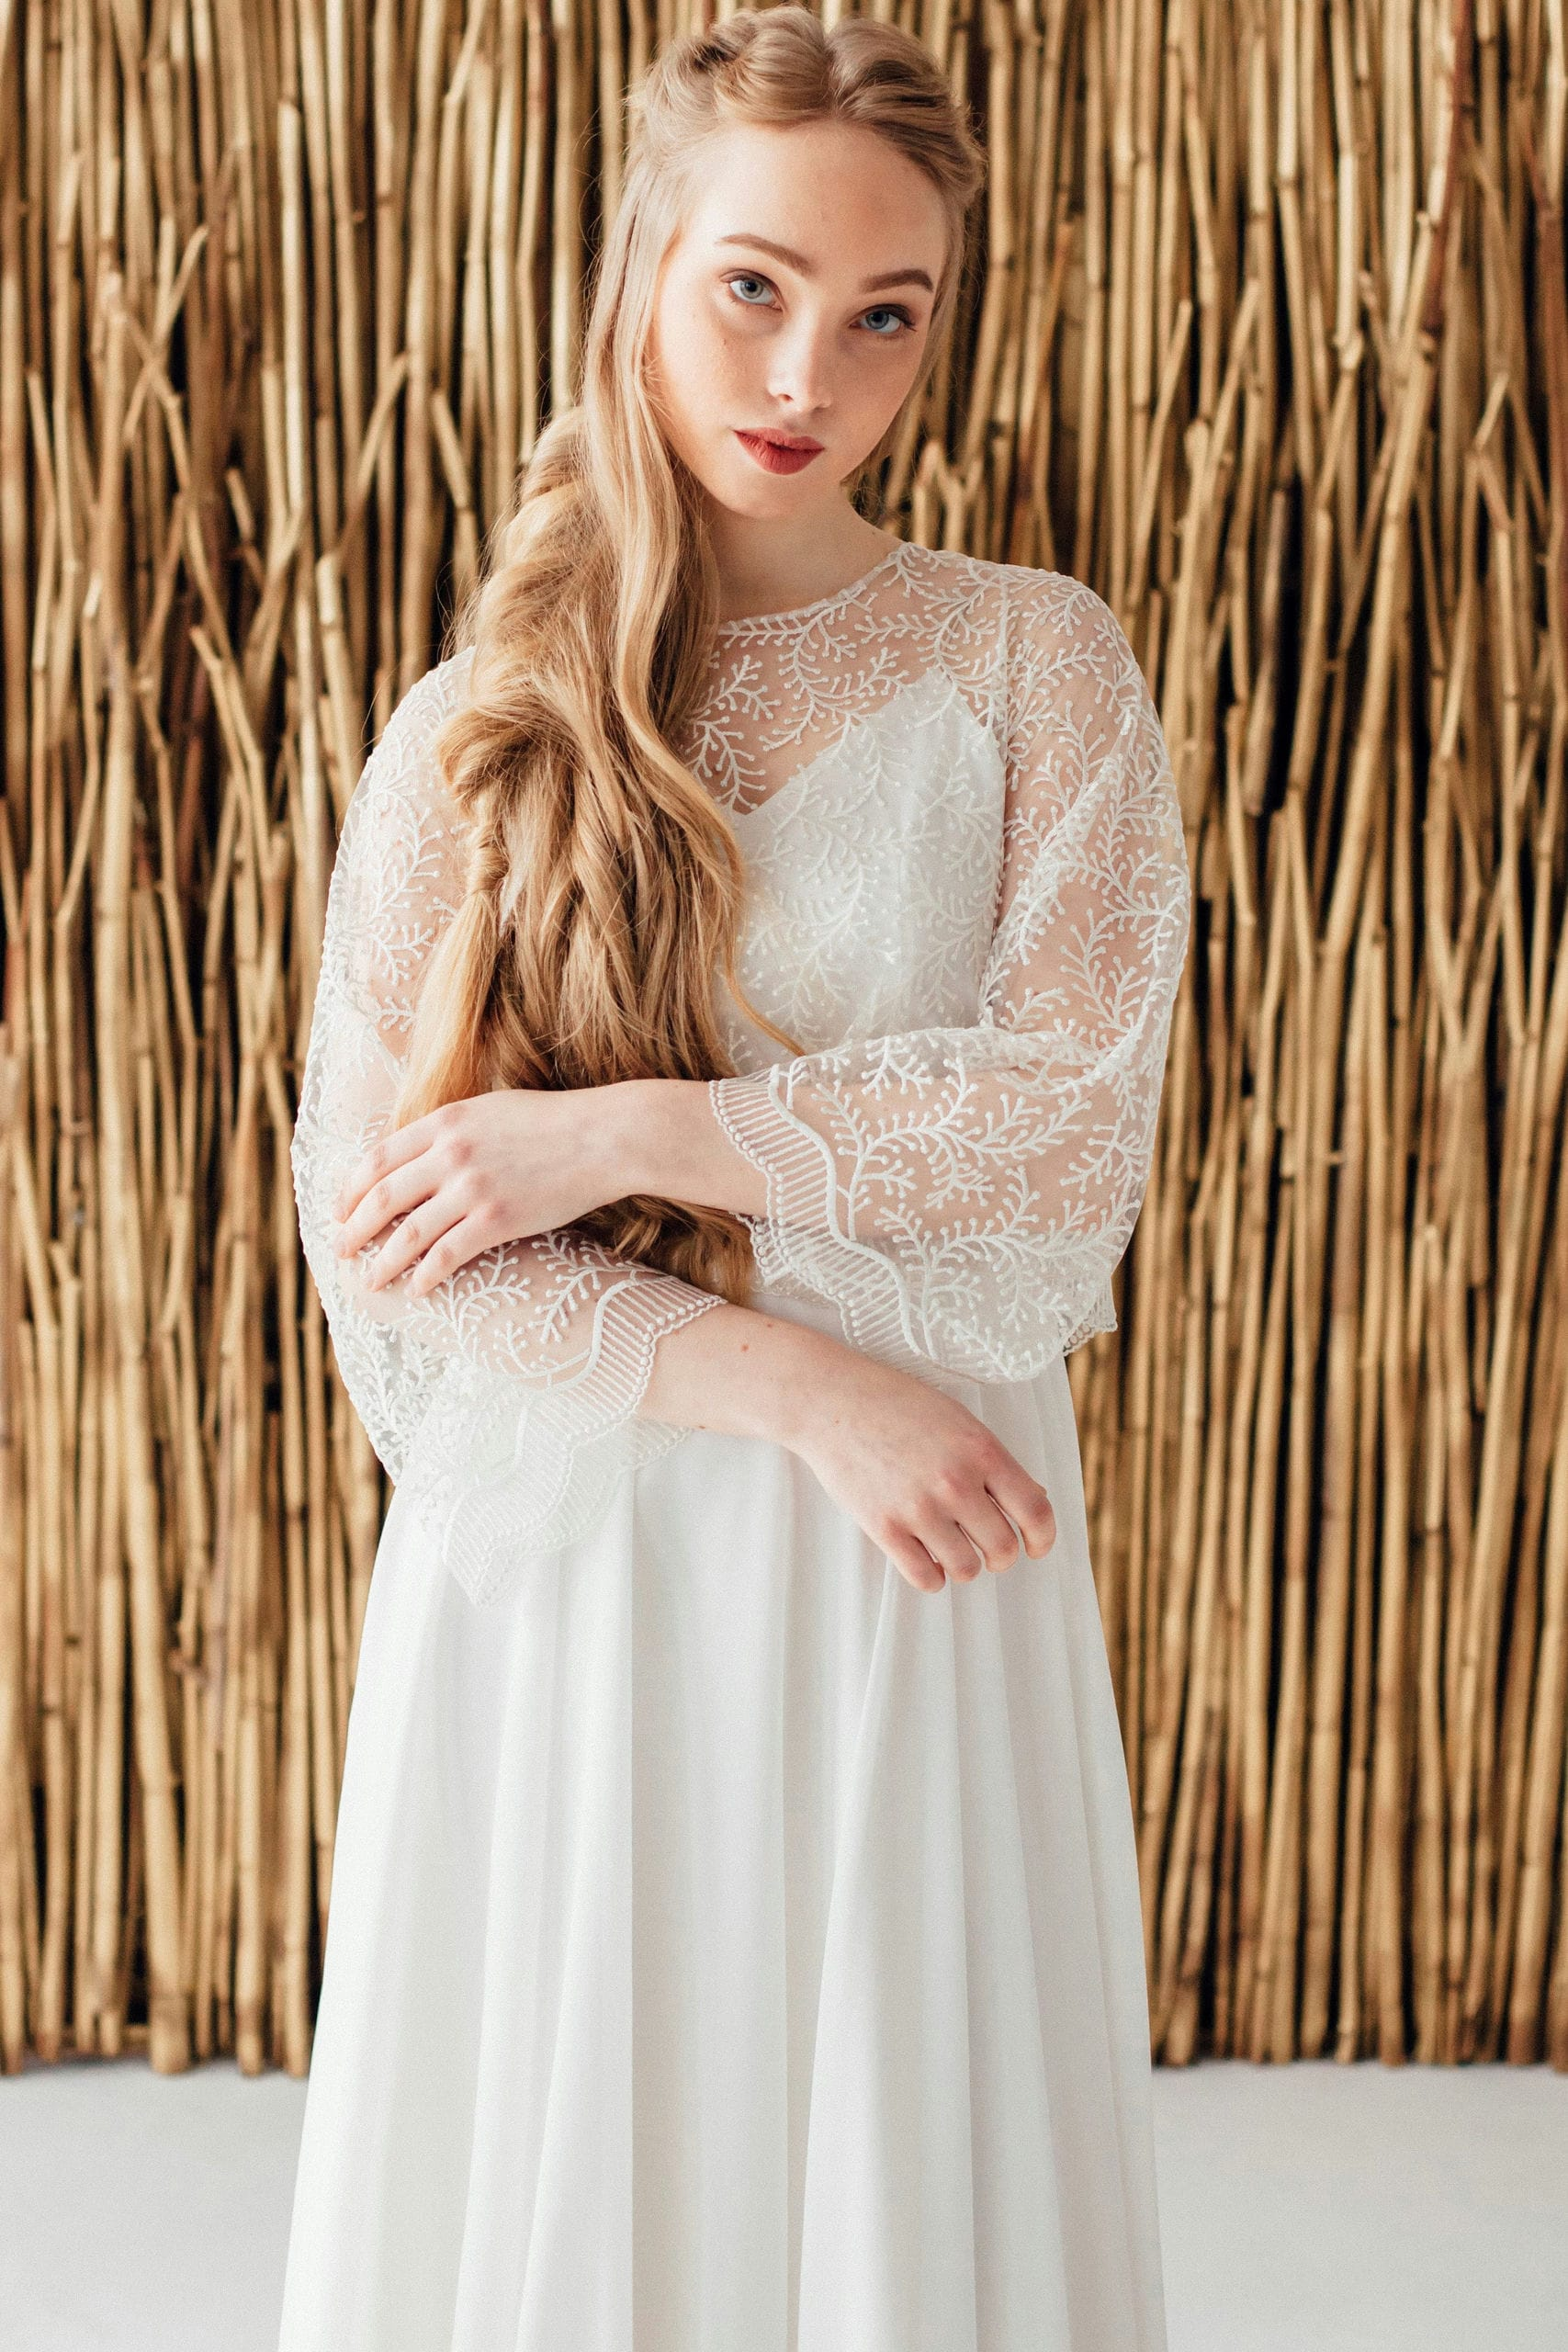 Свадебное платье SILENA, коллекция MAGIC OF TENDERNESS, бренд LORA SONG, фото 2